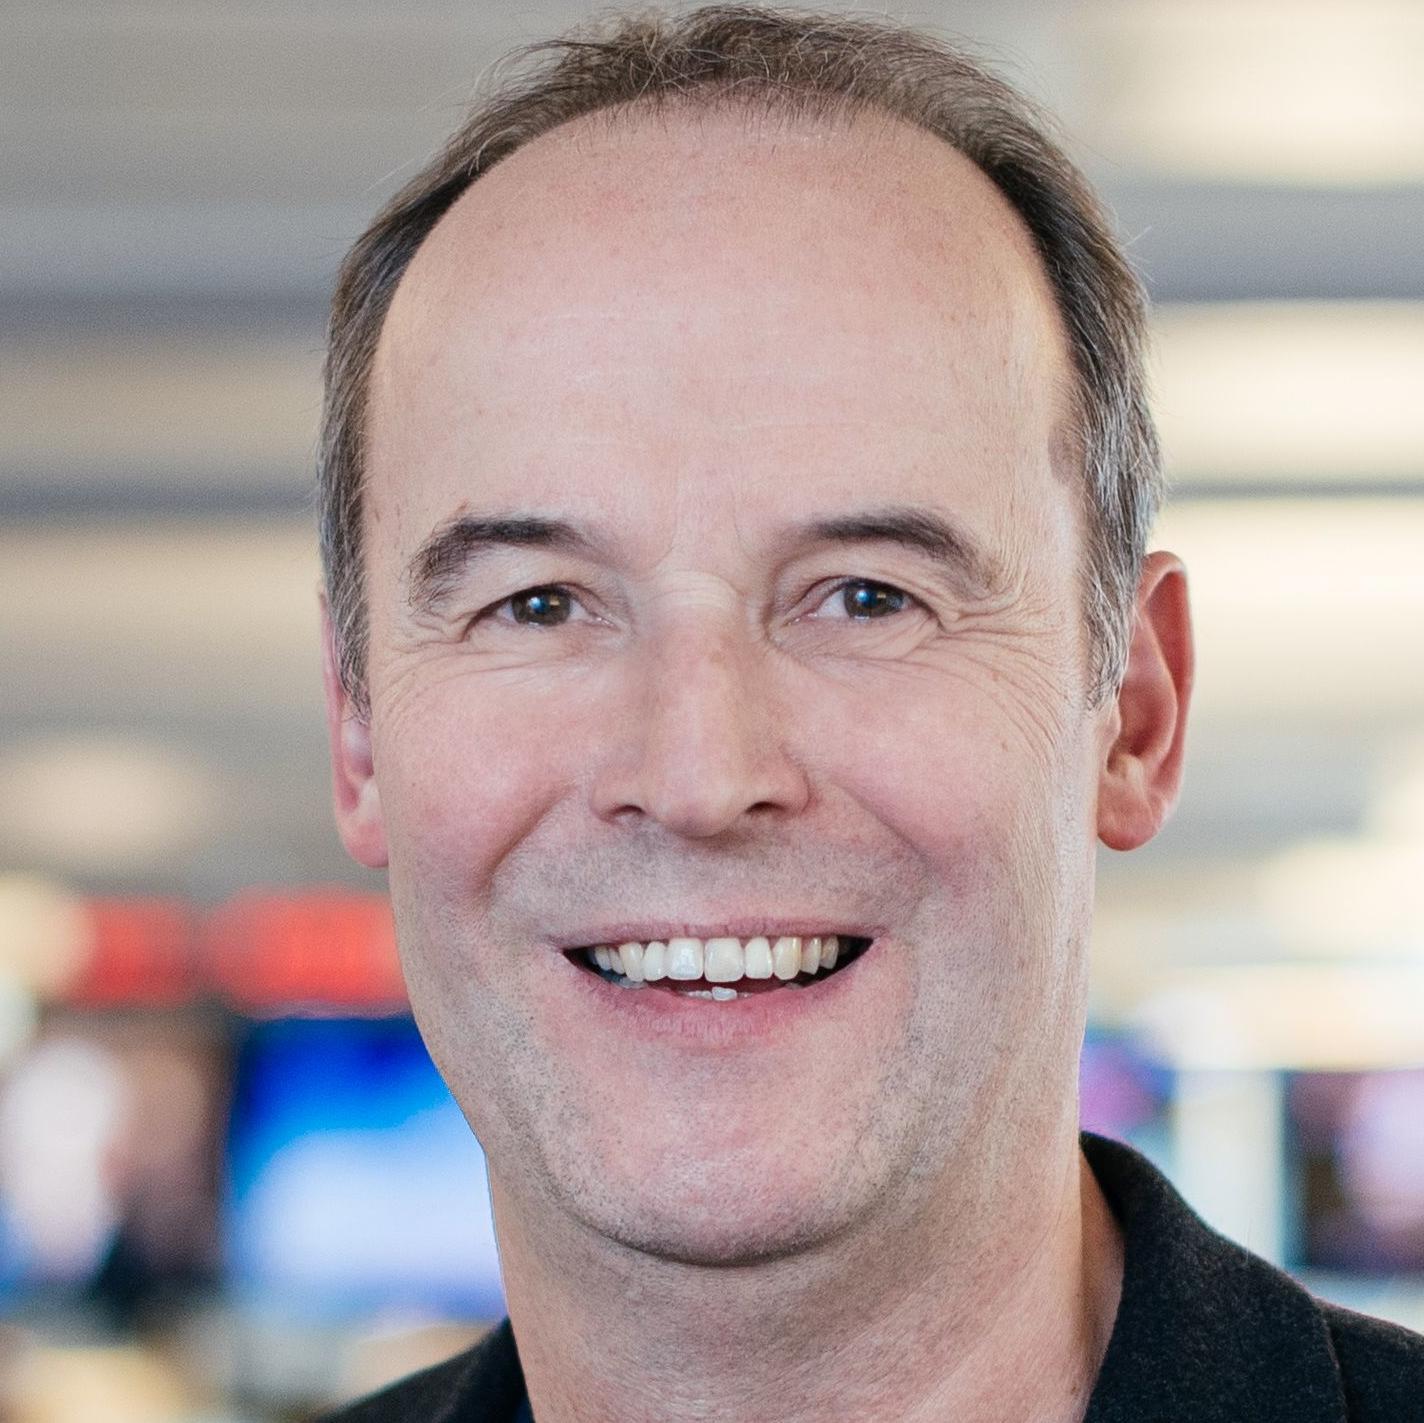 Christoph Dicke